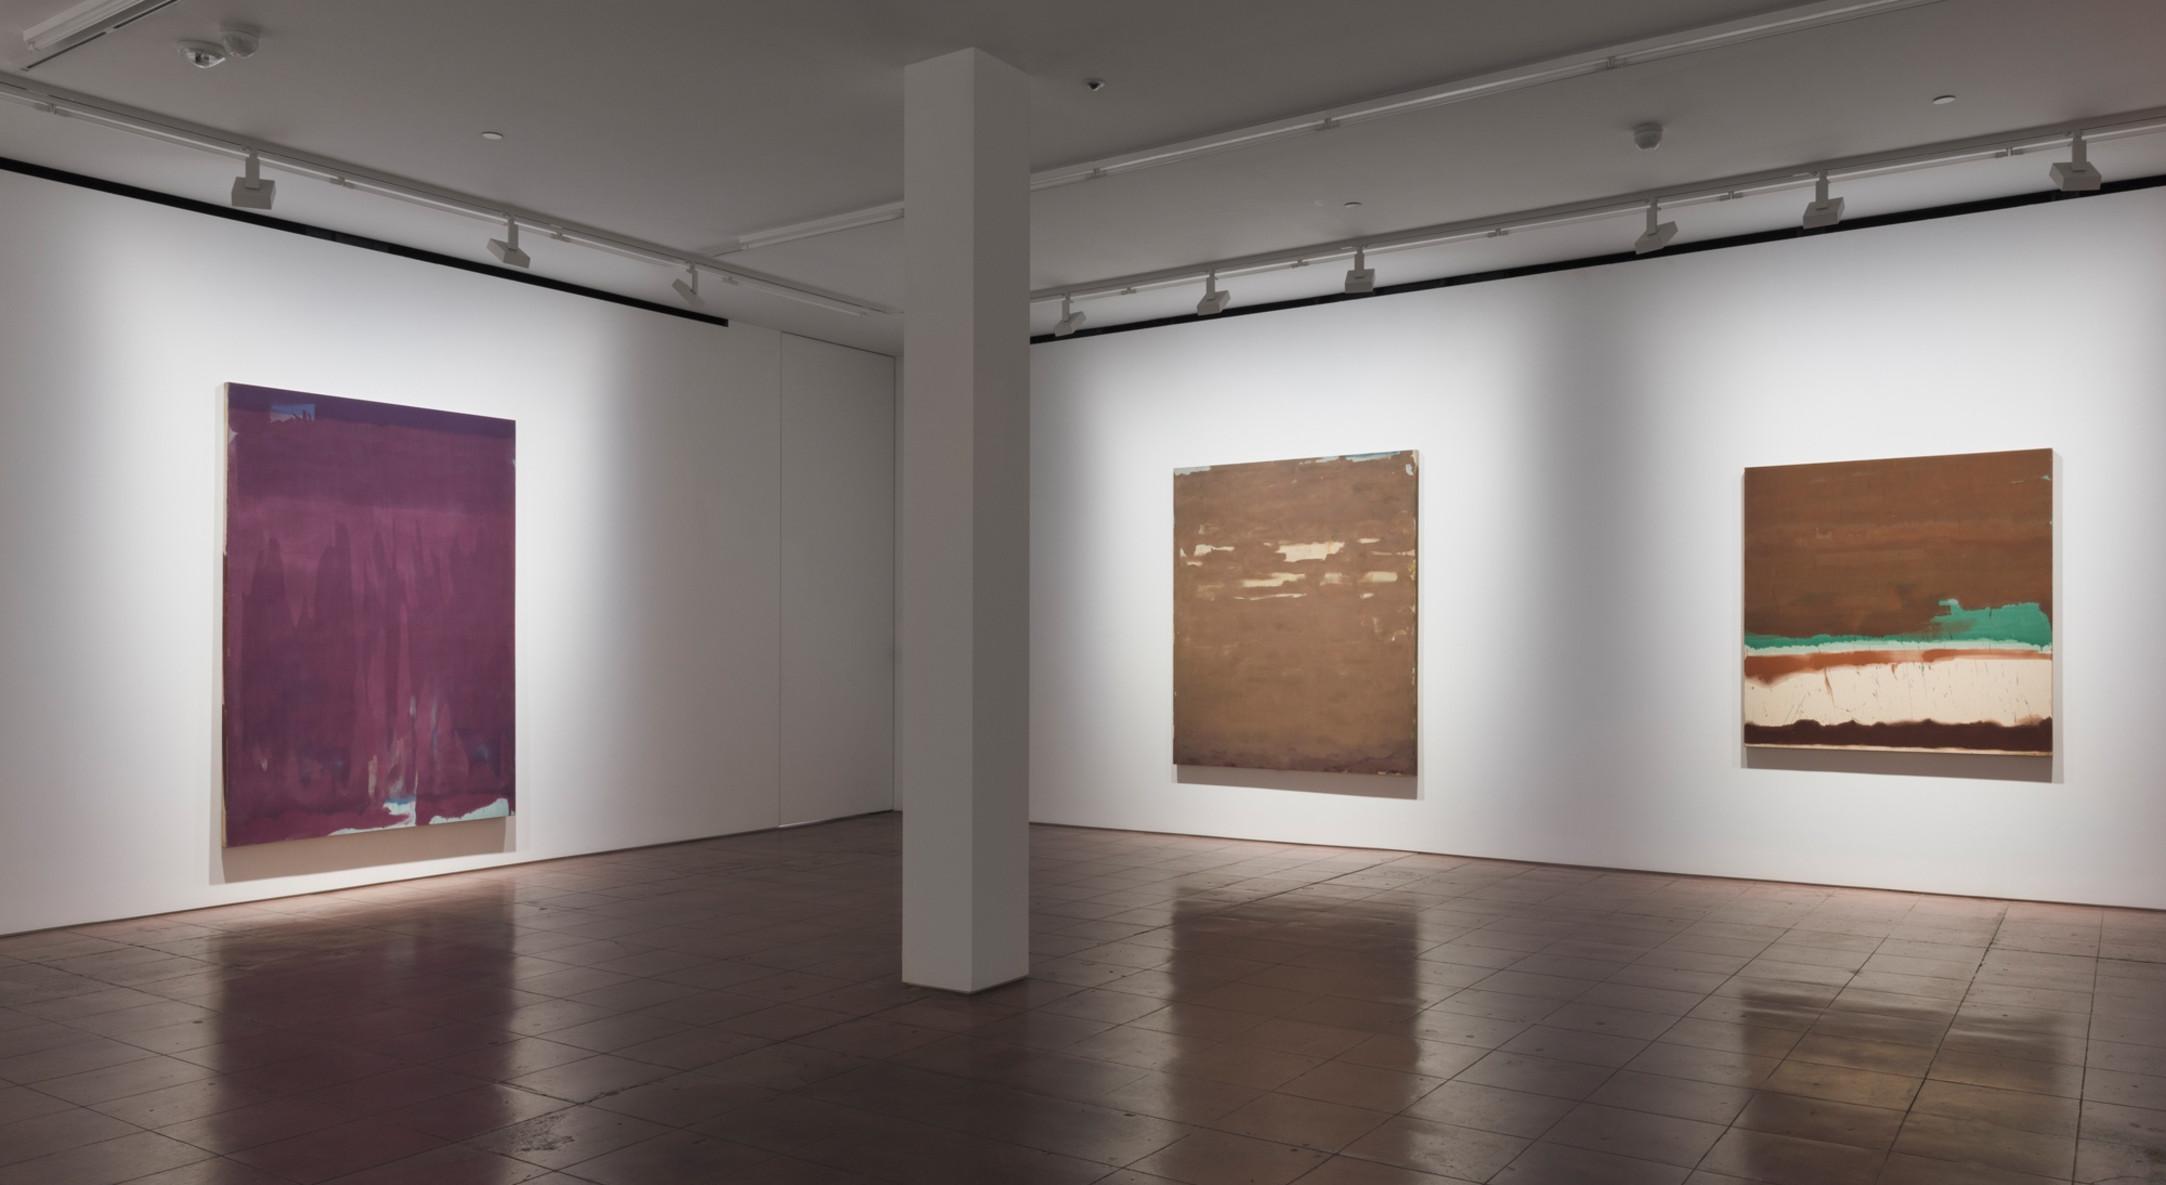 Virginia Jaramillo, Conflux, 10 September - 14 November 2020, Hales New York